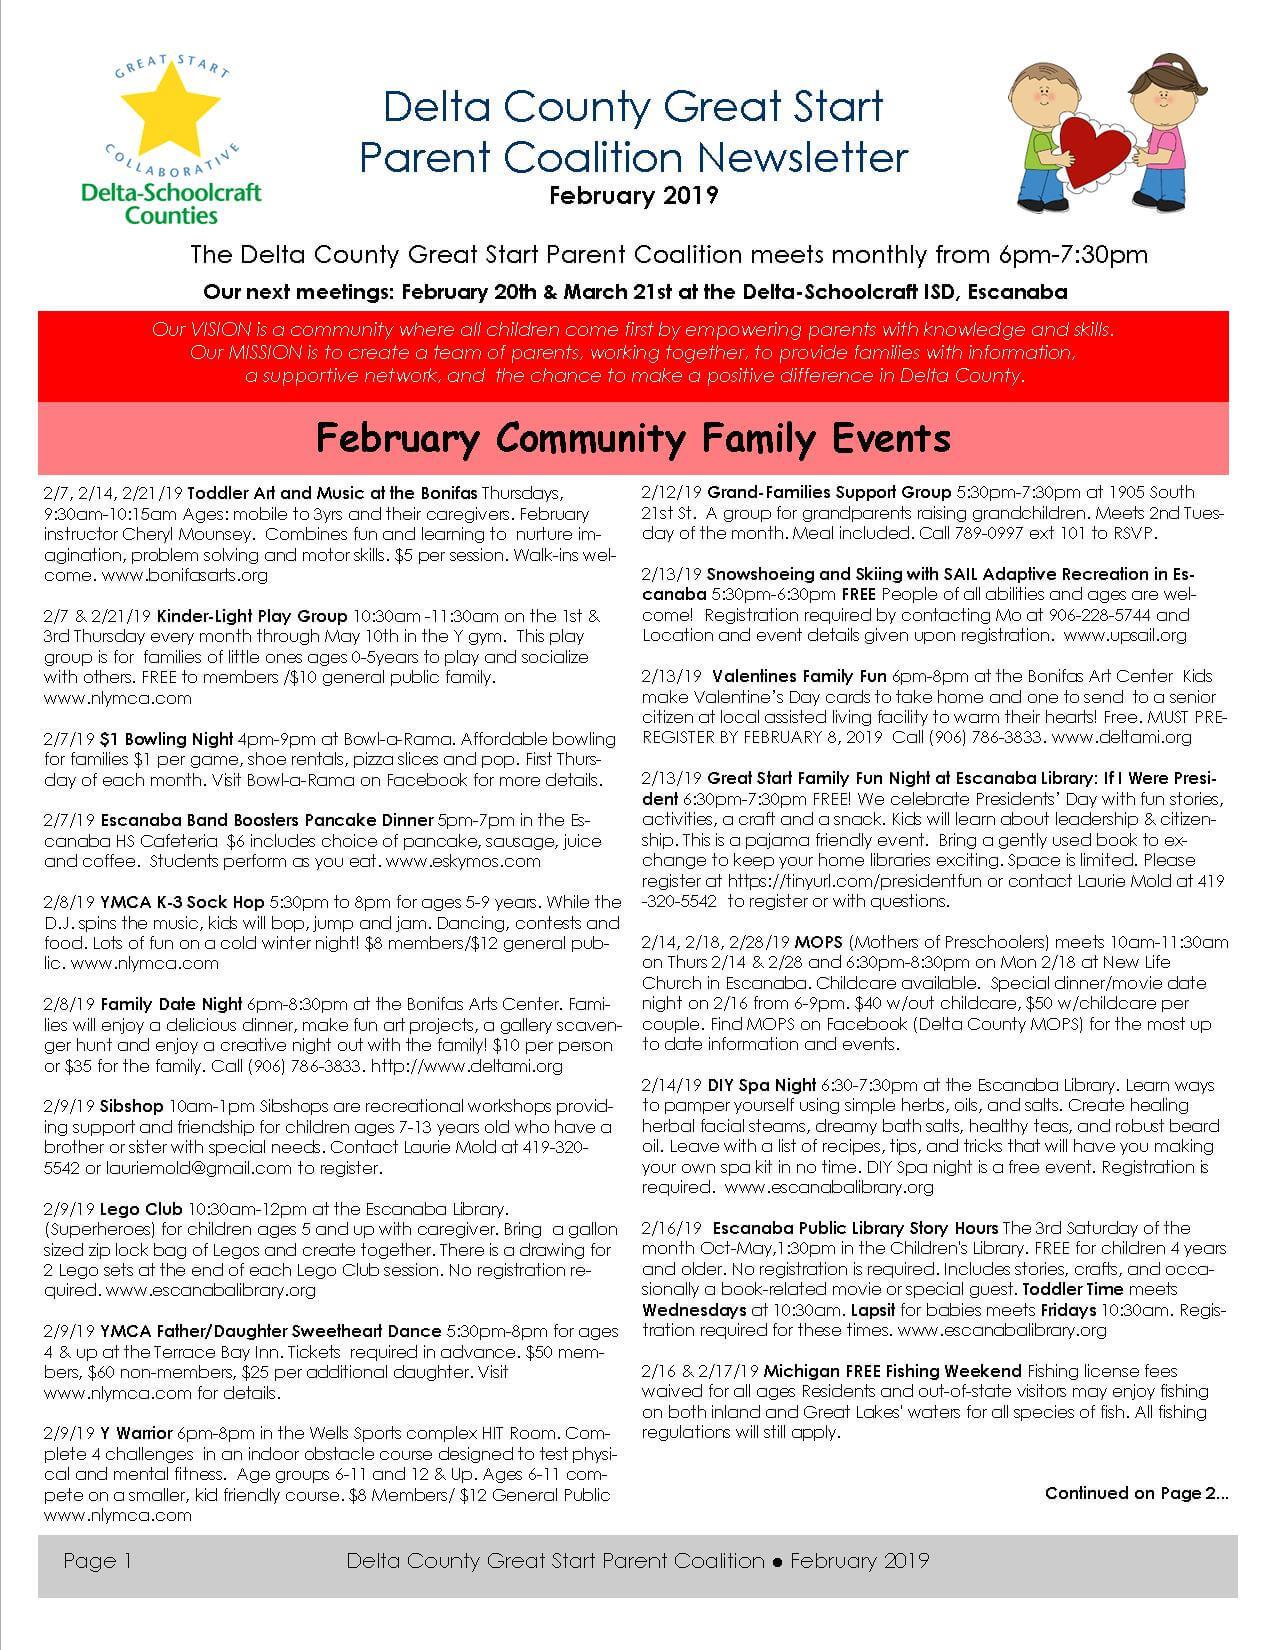 Delta County Great Start Parent Coalition Newsletter February 2019 pg1